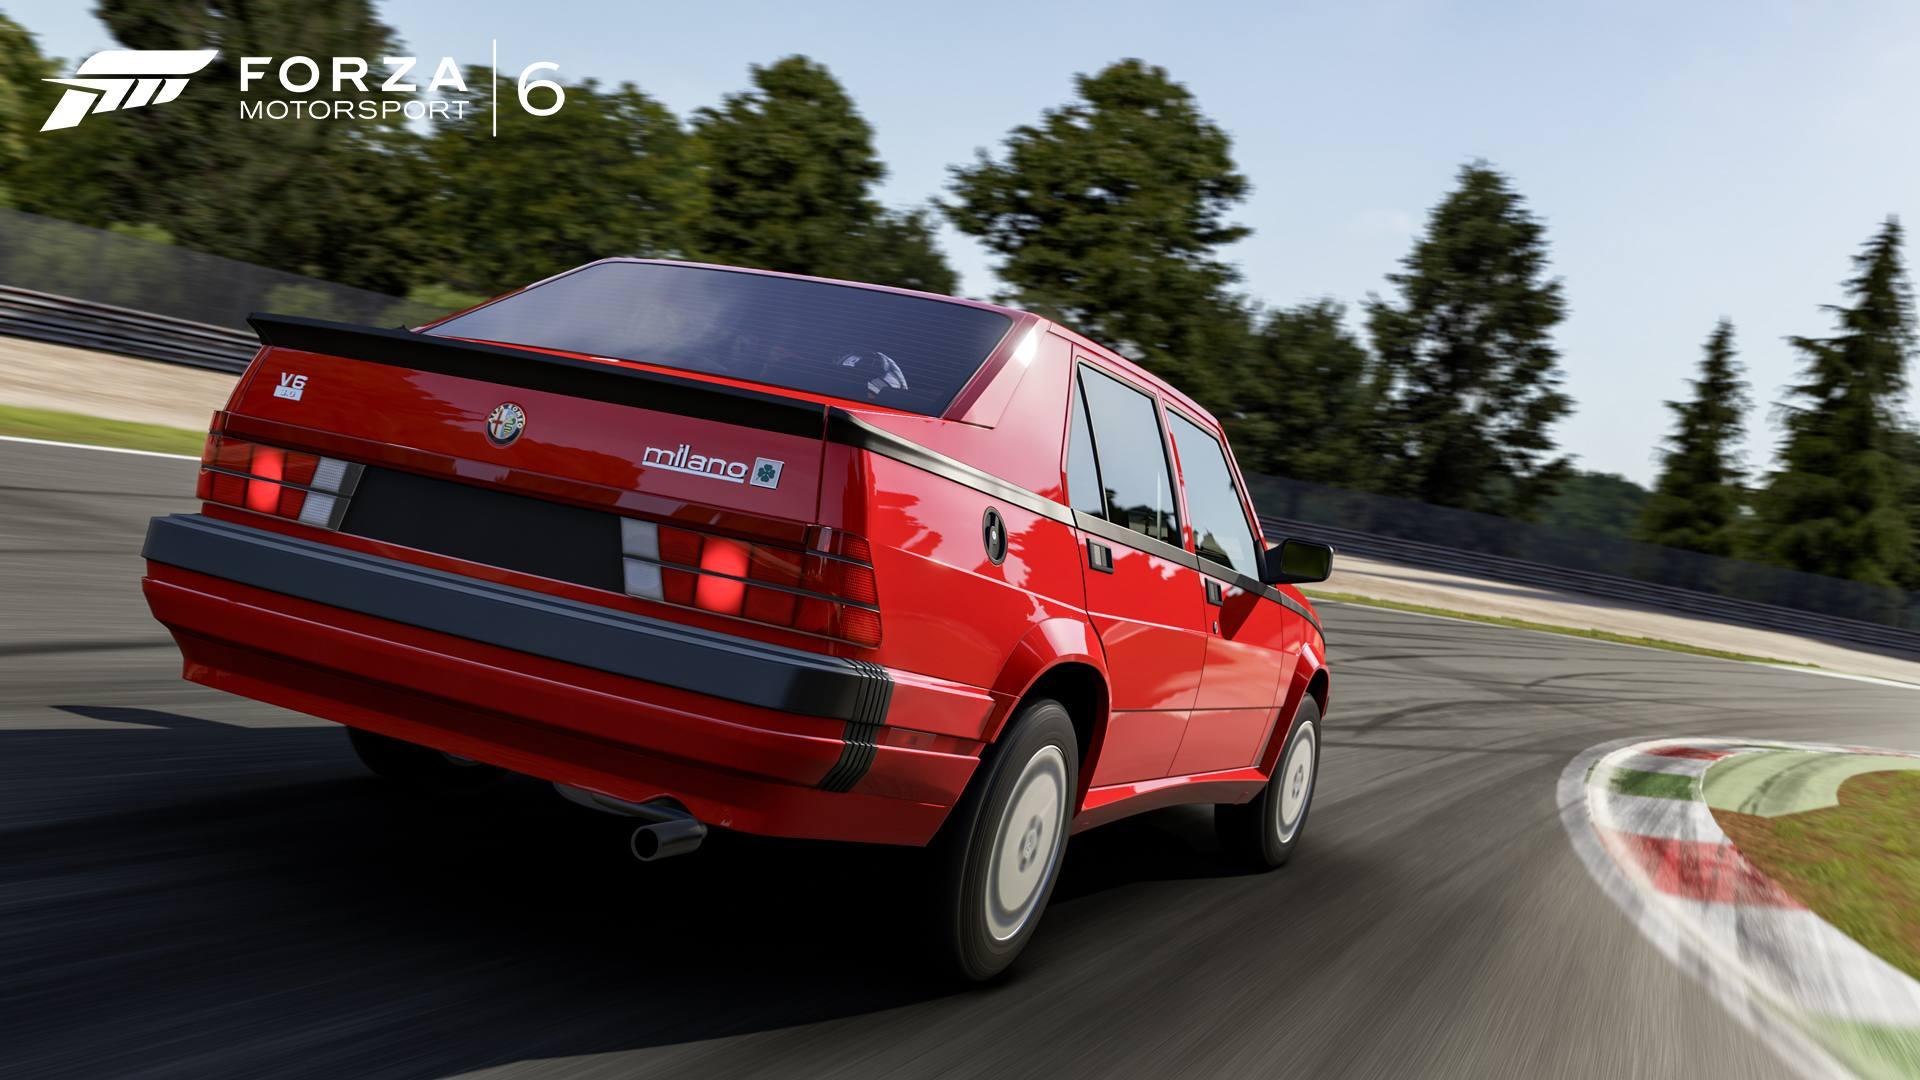 Forza Motorsport 6 27-01-16 1992 Alfa Romeo Milano Quadrifoglio Verde